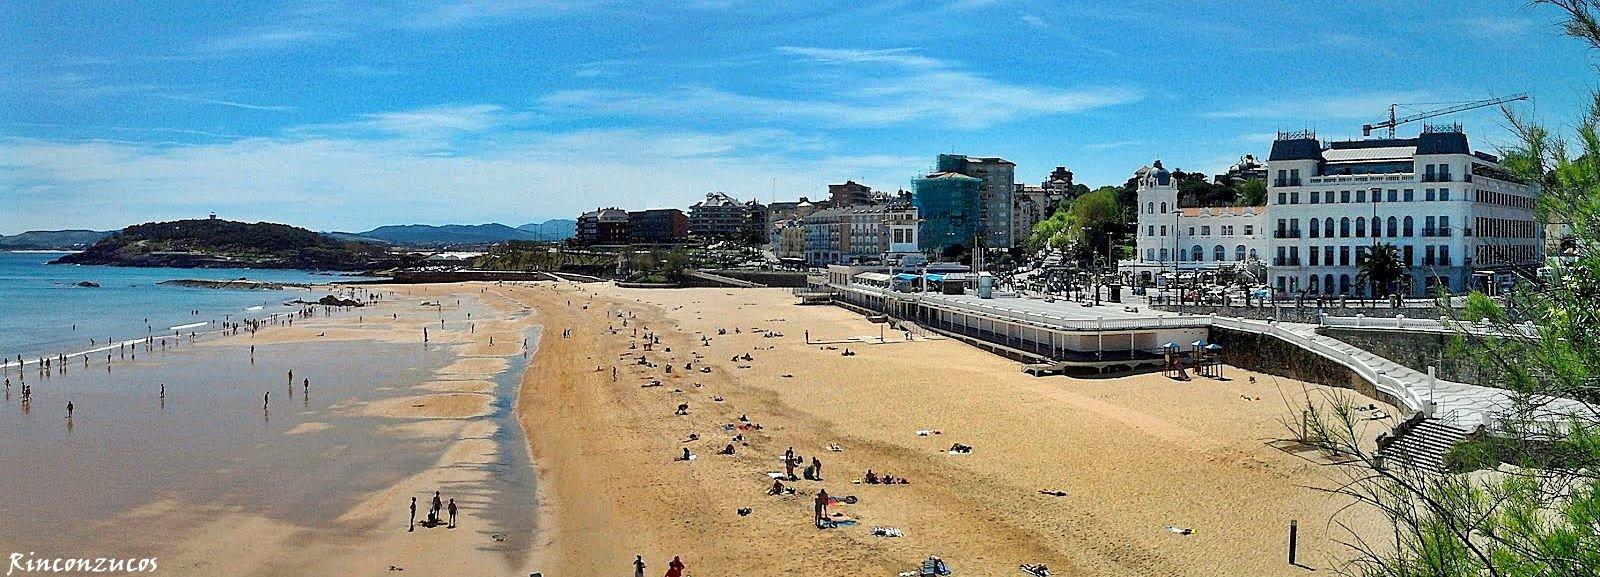 Primera-Playa-del-Sardinero-2.jpg